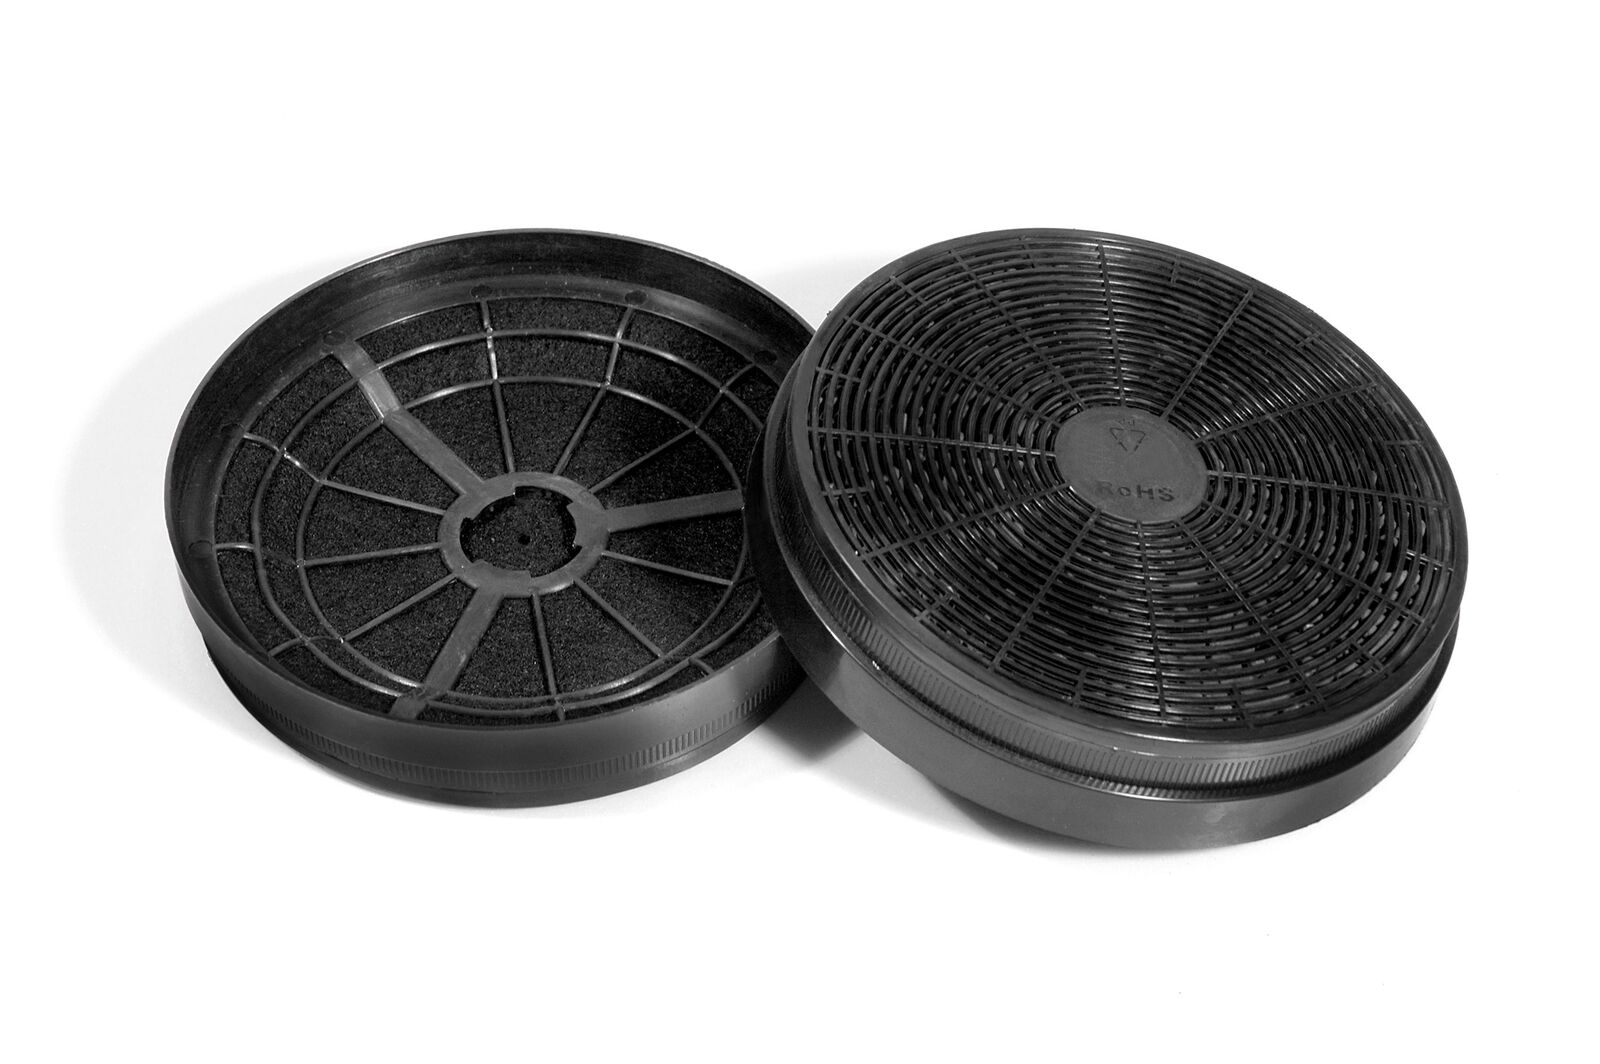 Aktivkohlefilter pkm cf110 kohlefilter filter für